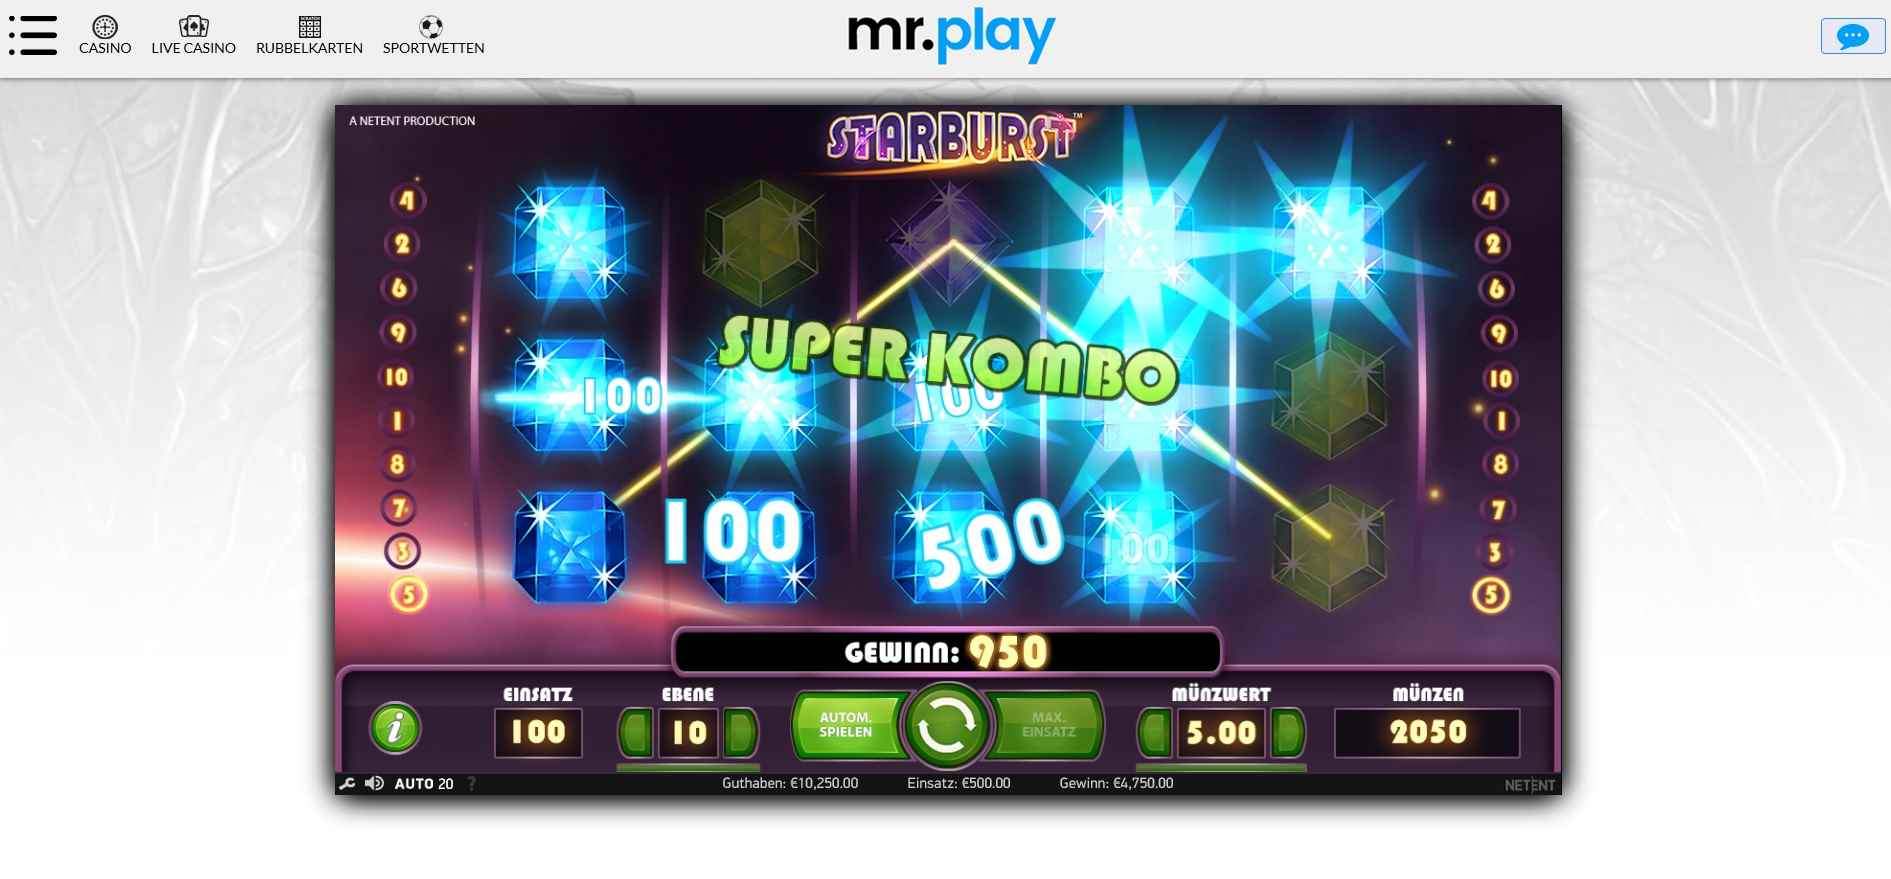 MrPlay spielen